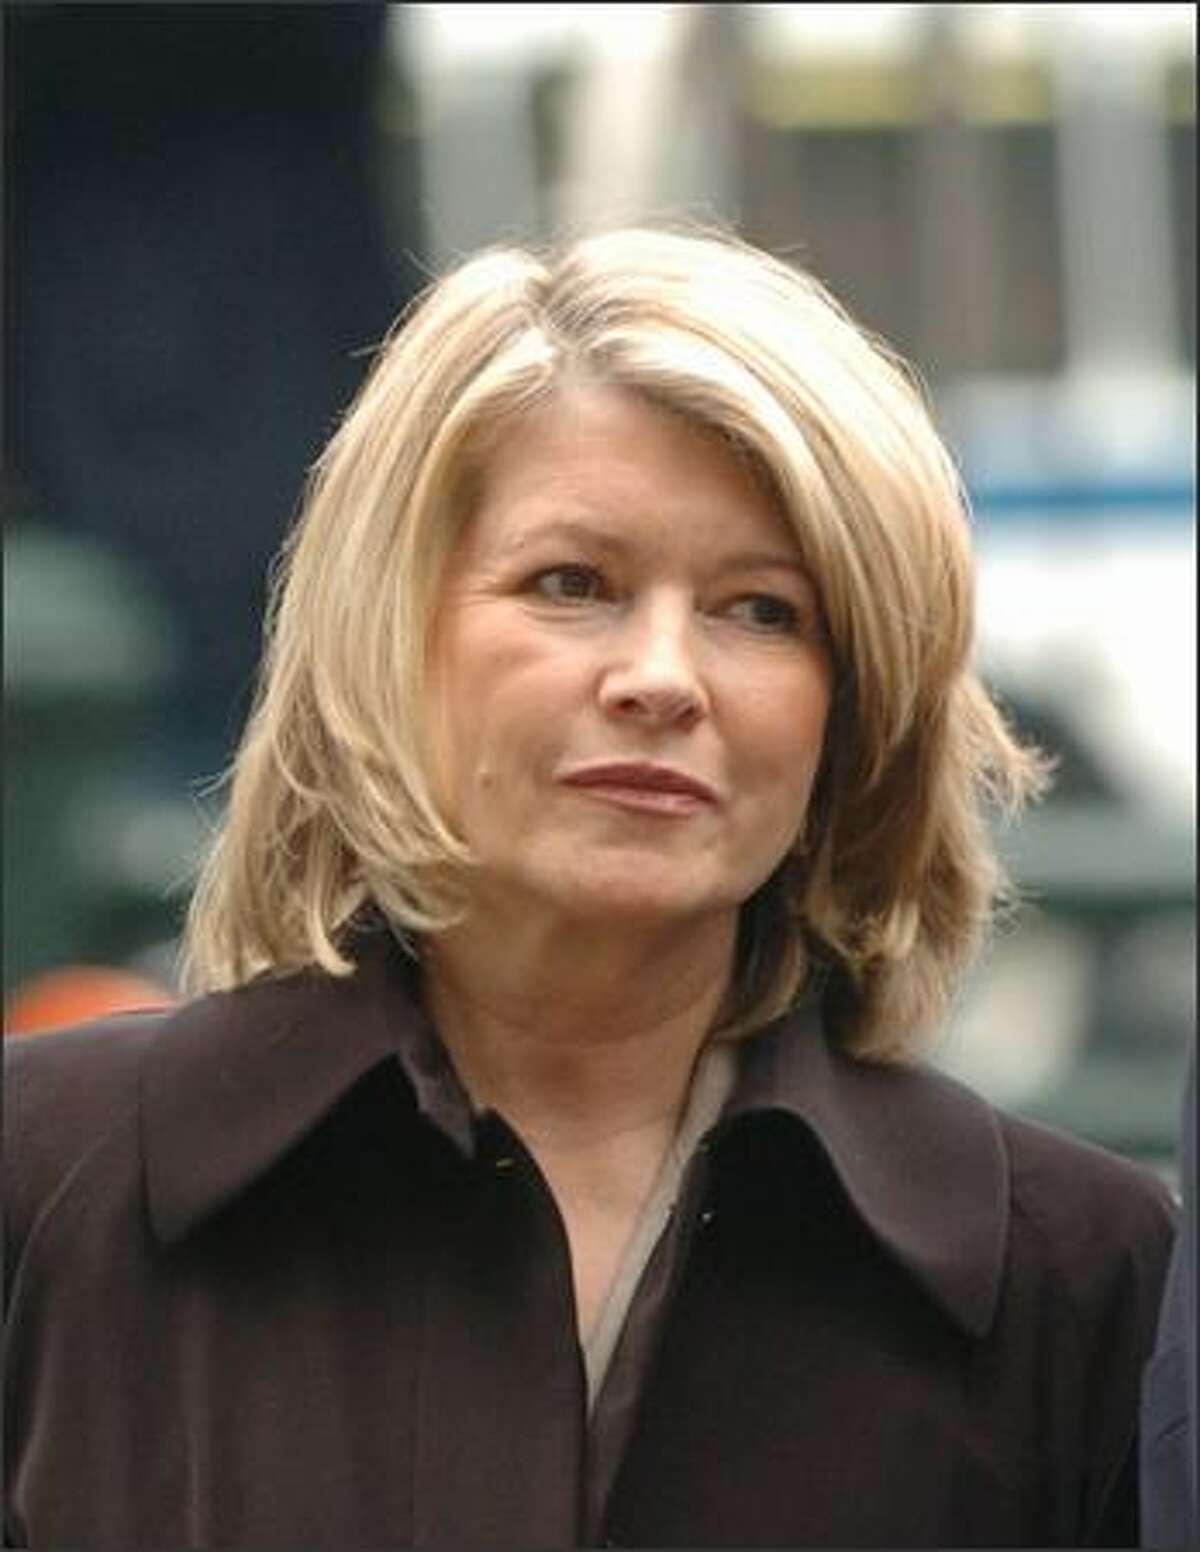 Martha Stewart enters Manhattan federal court, Tuesday, March, 2, 2004, in New York. (AP Photo/ Louis Lanzano)